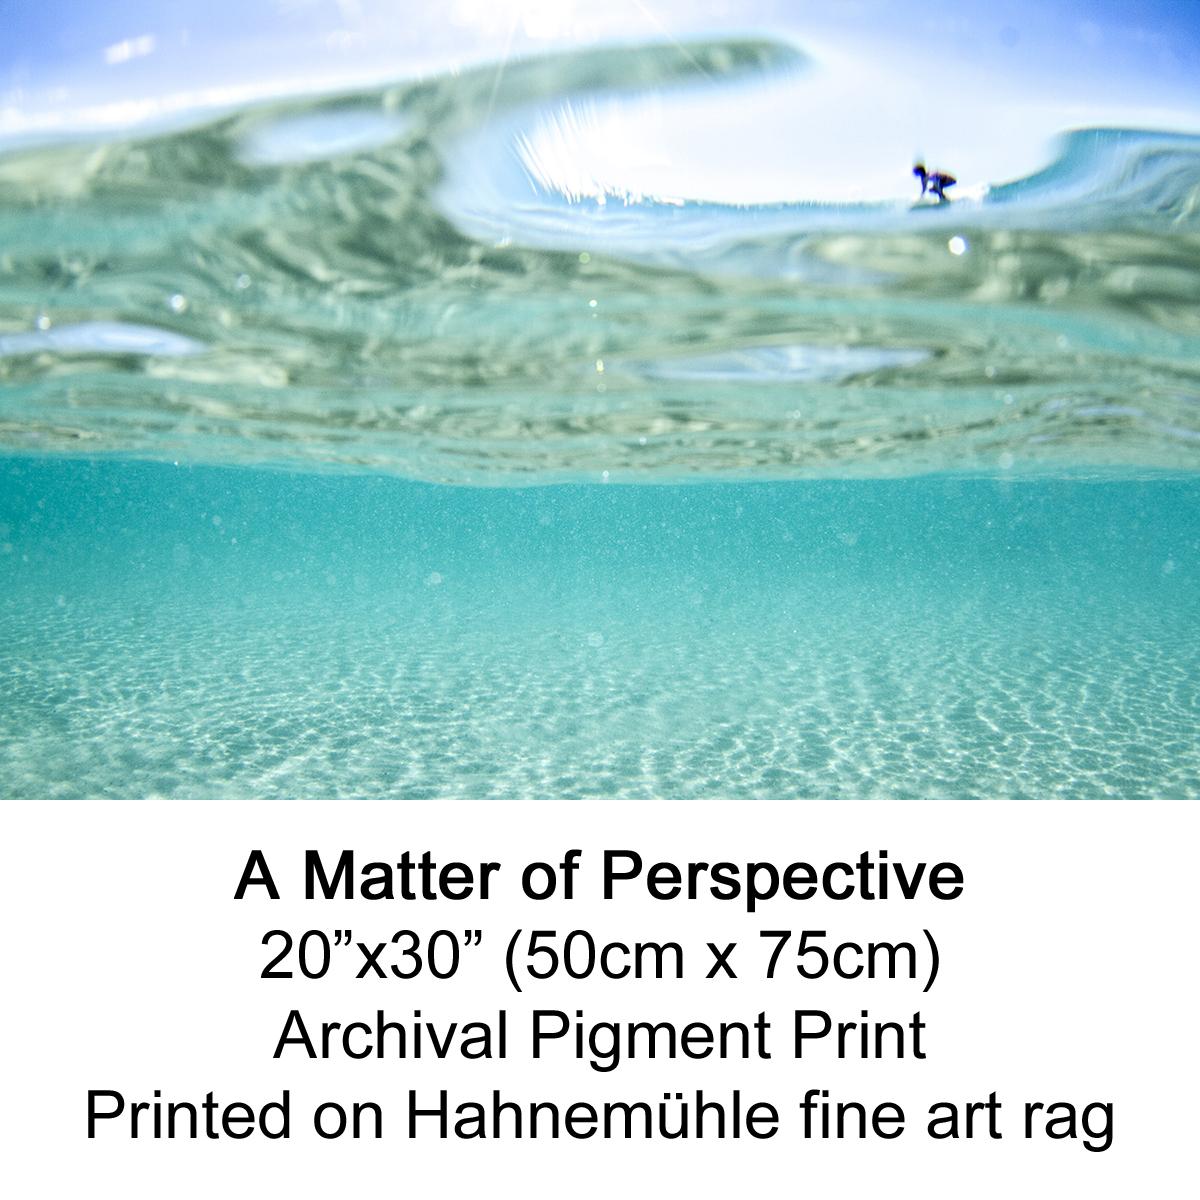 A Matter of Perspective by fran miller.jpg